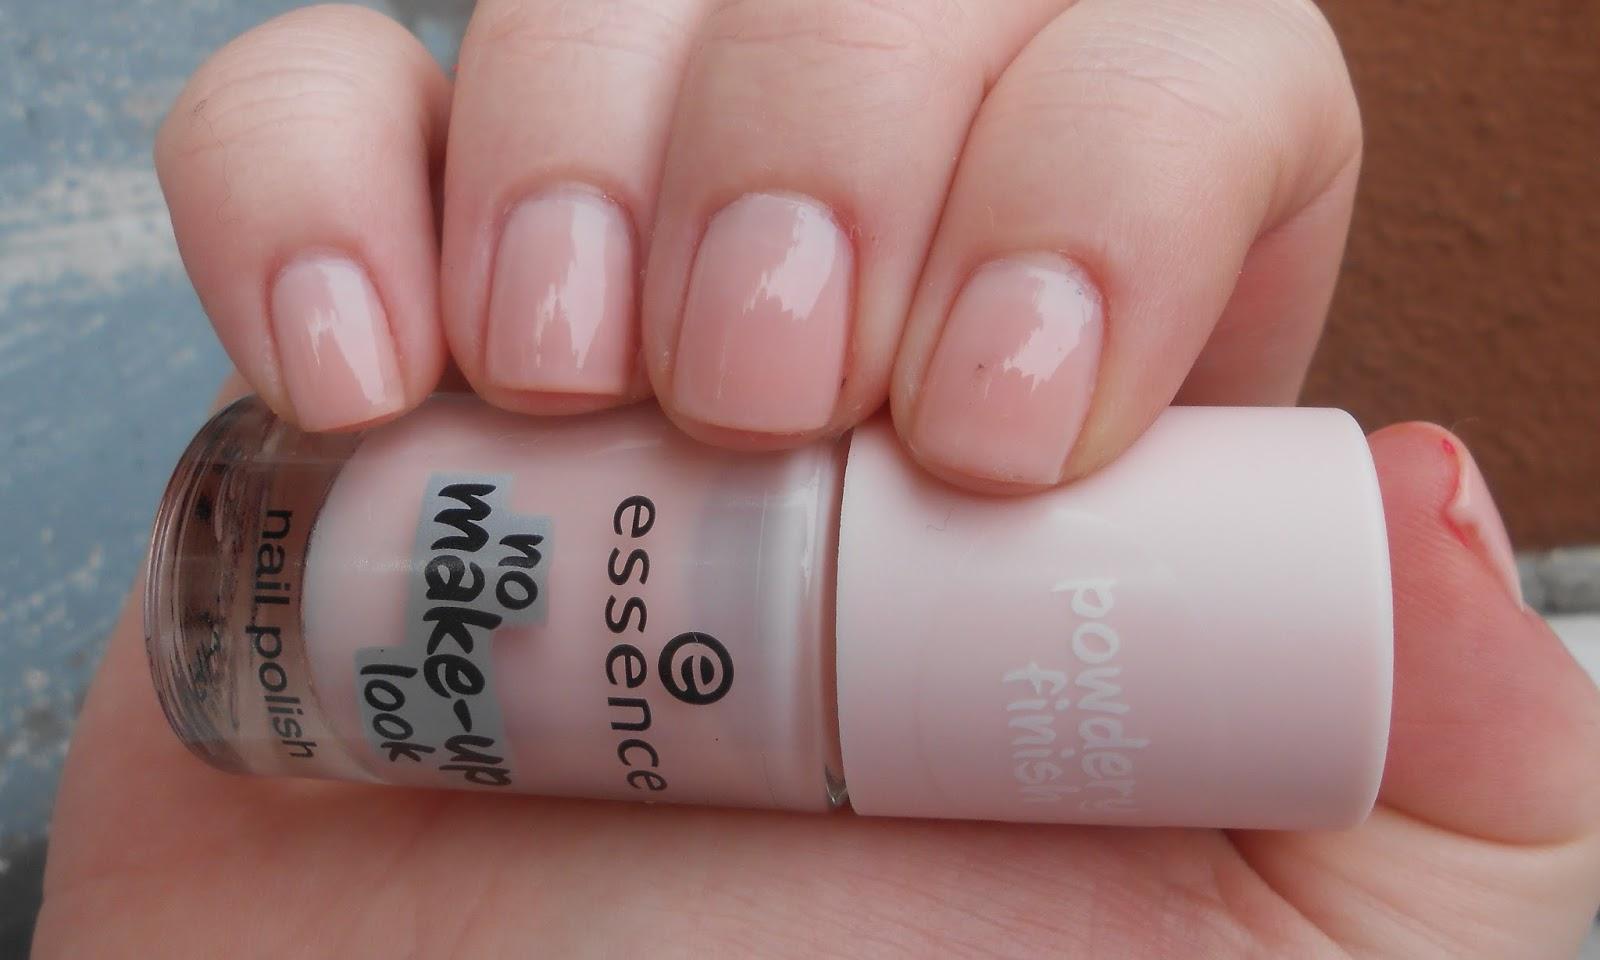 hautnah beauty nails essence no make up look nail polish in 01 powdery rose. Black Bedroom Furniture Sets. Home Design Ideas